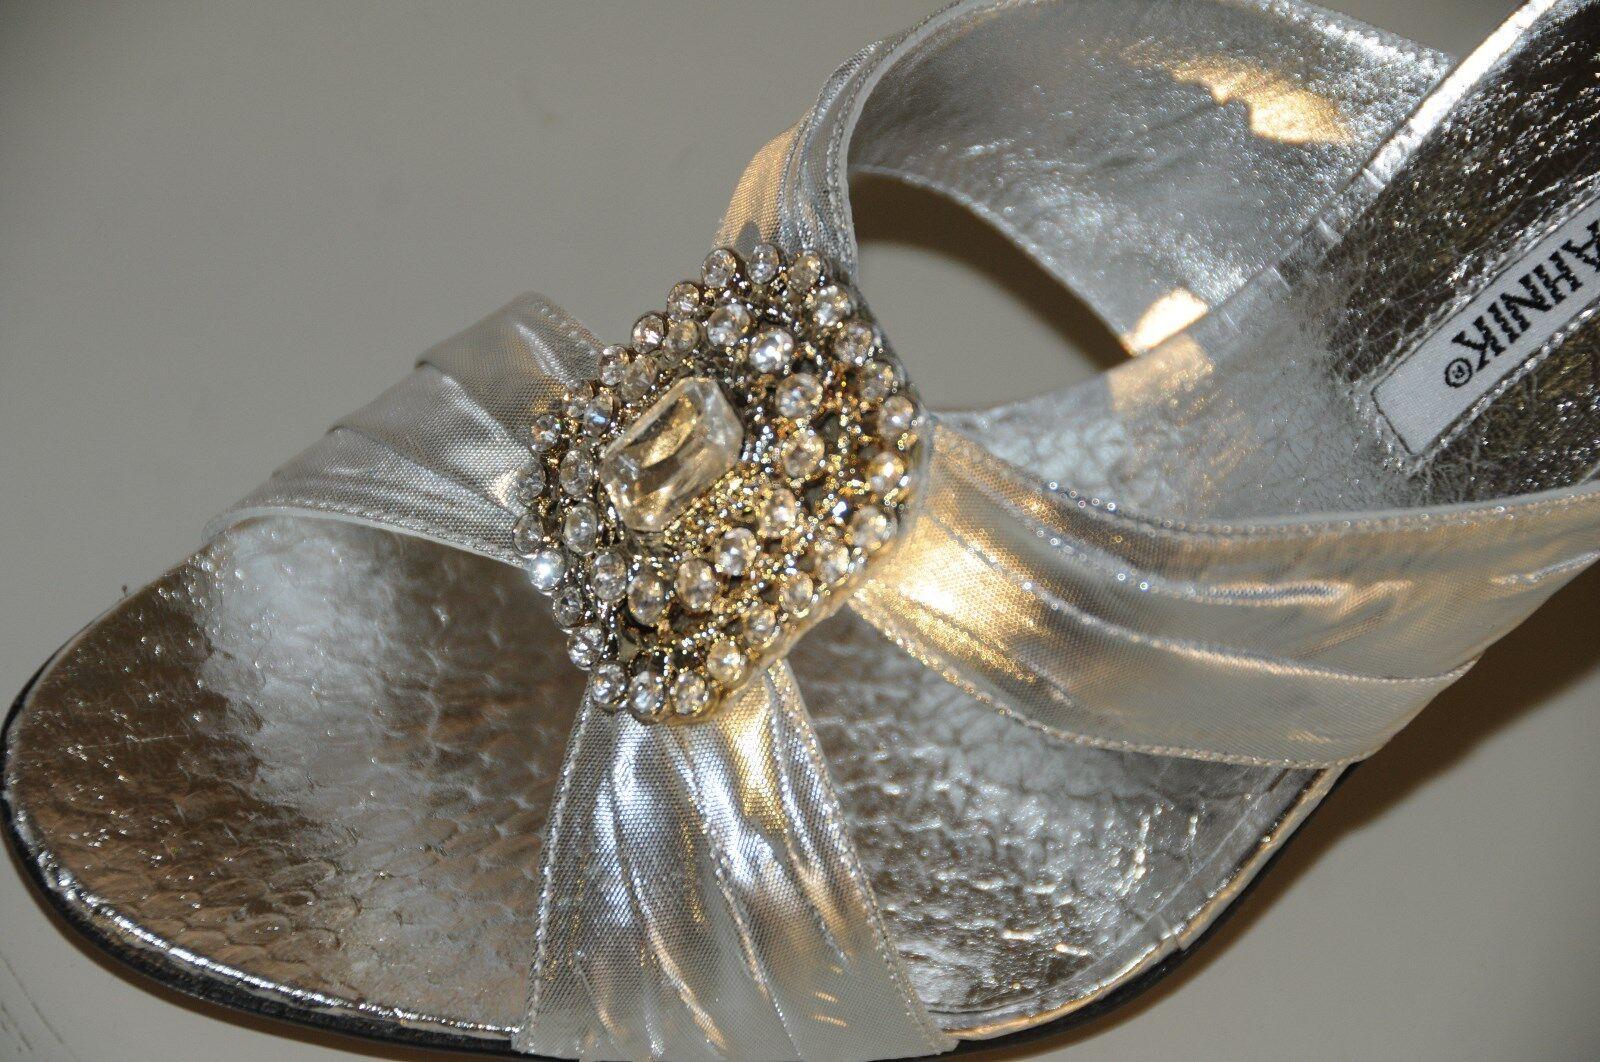 garanzia di credito Nuovo Manolo Blahnik Ingioiellato argentoo argentoo argentoo Pitone Epais Matrimonio Sandali Scarpe  ecco l'ultimo